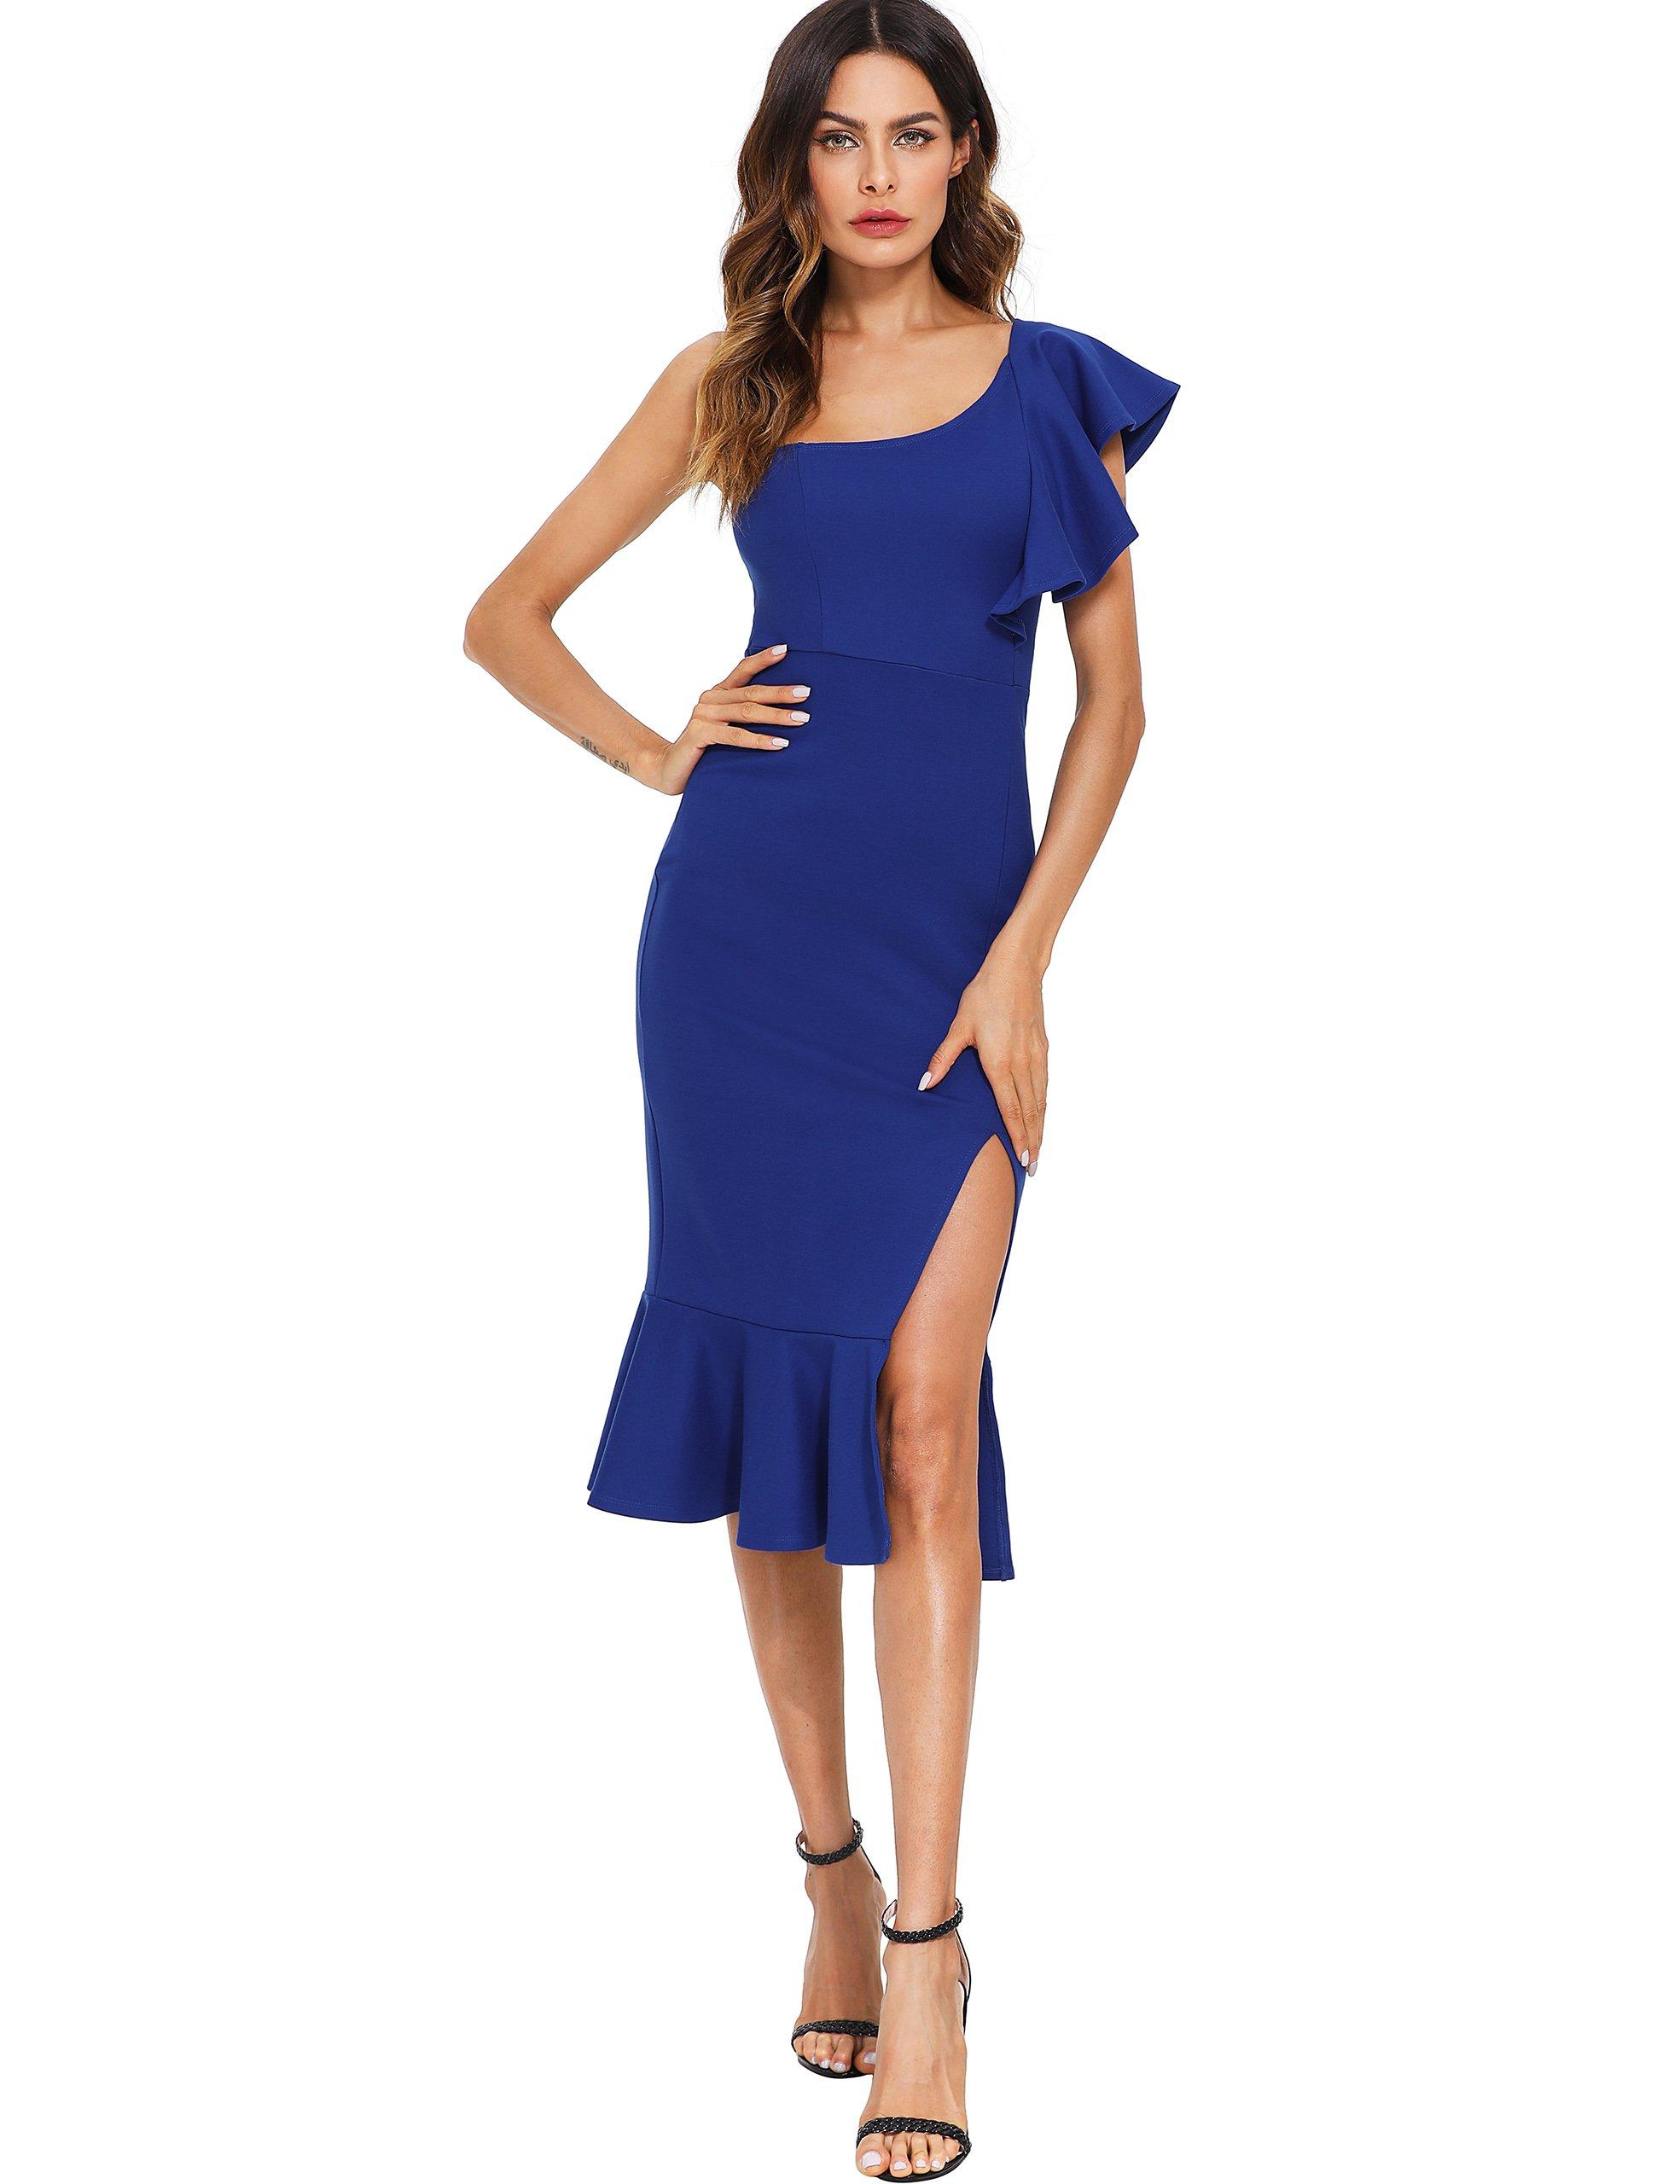 Floerns Women's Ruffle One Shoulder Split Midi Party Bodycon Dress Blue L